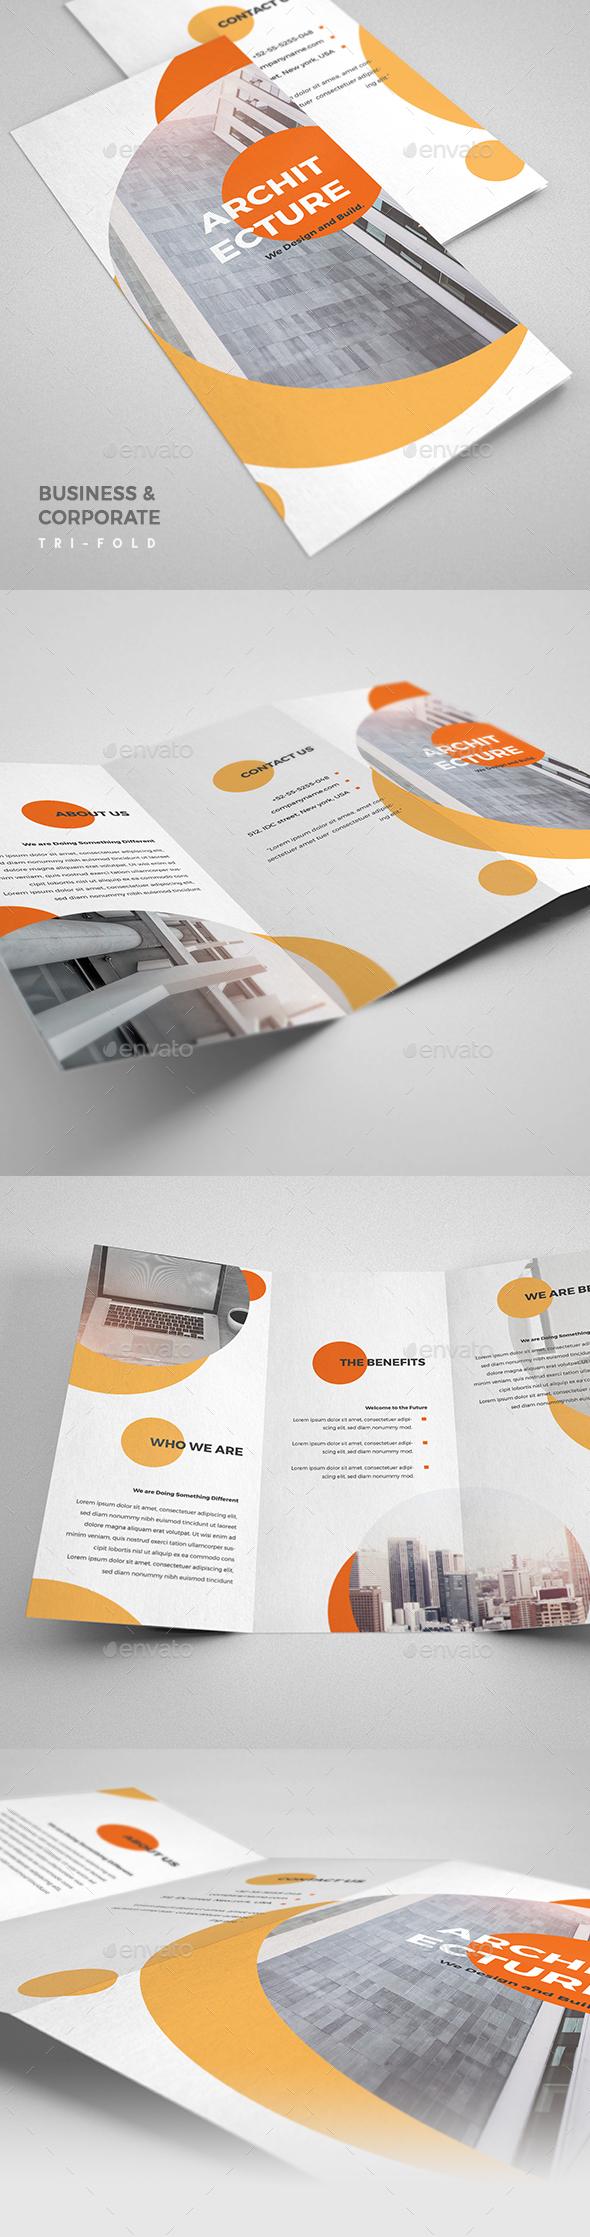 Architecture Design Tri-Fold Brochure - Brochures Print Templates